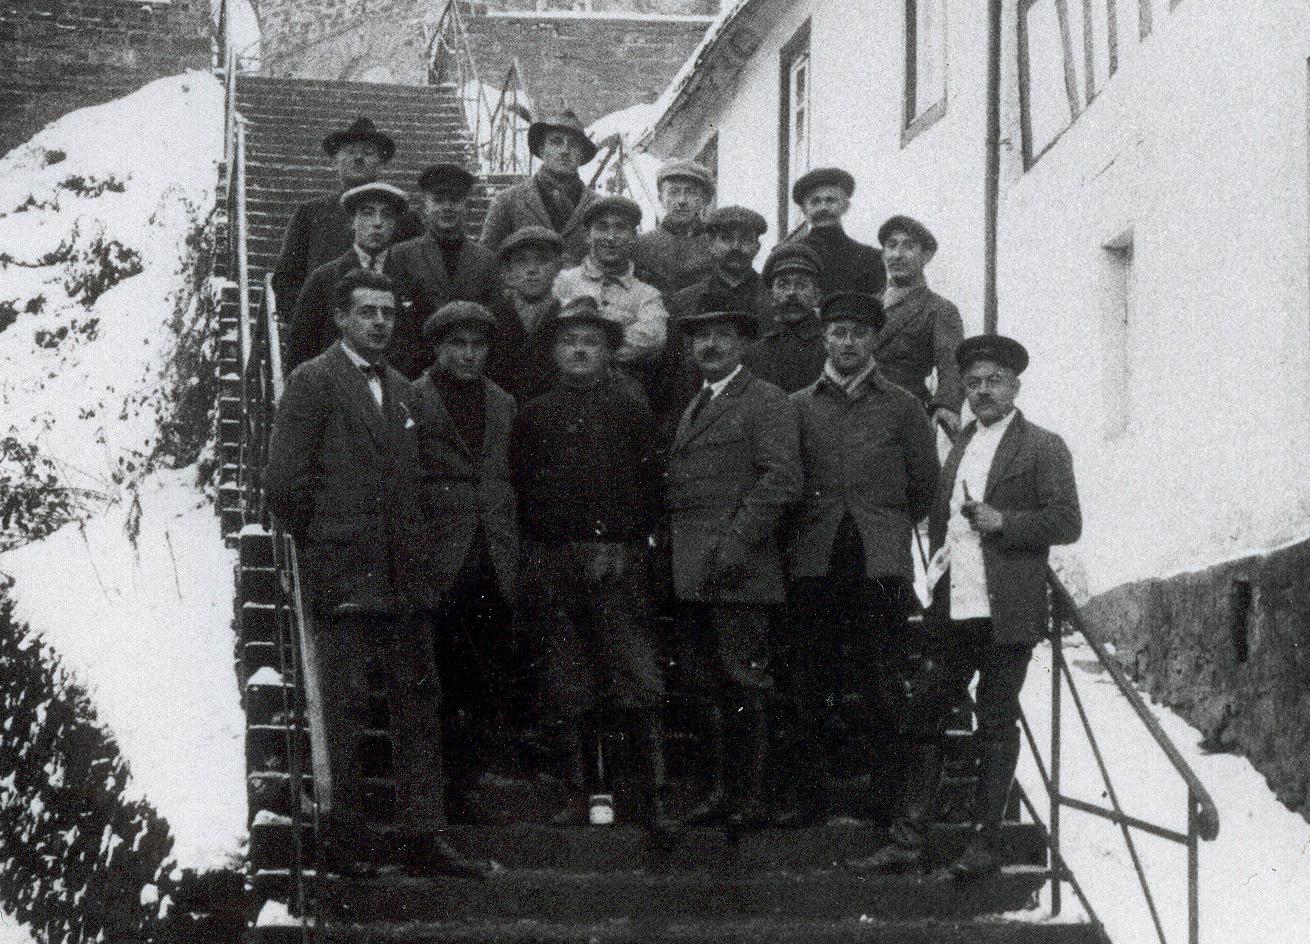 Die Helden der Kirchturmreparatur 1926